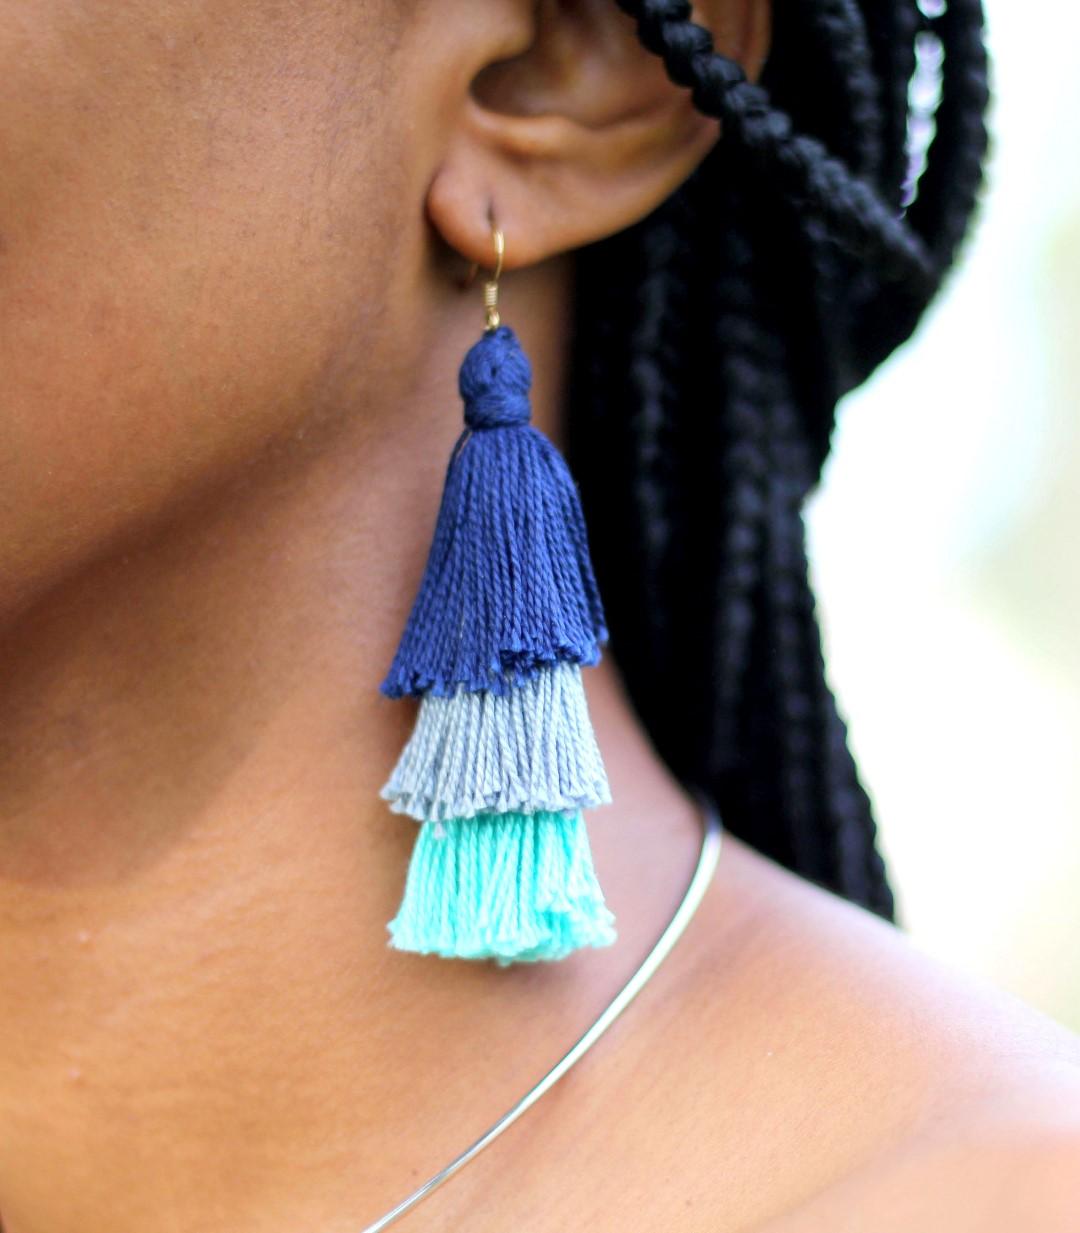 cassie daves wearing the tassel statement earrings